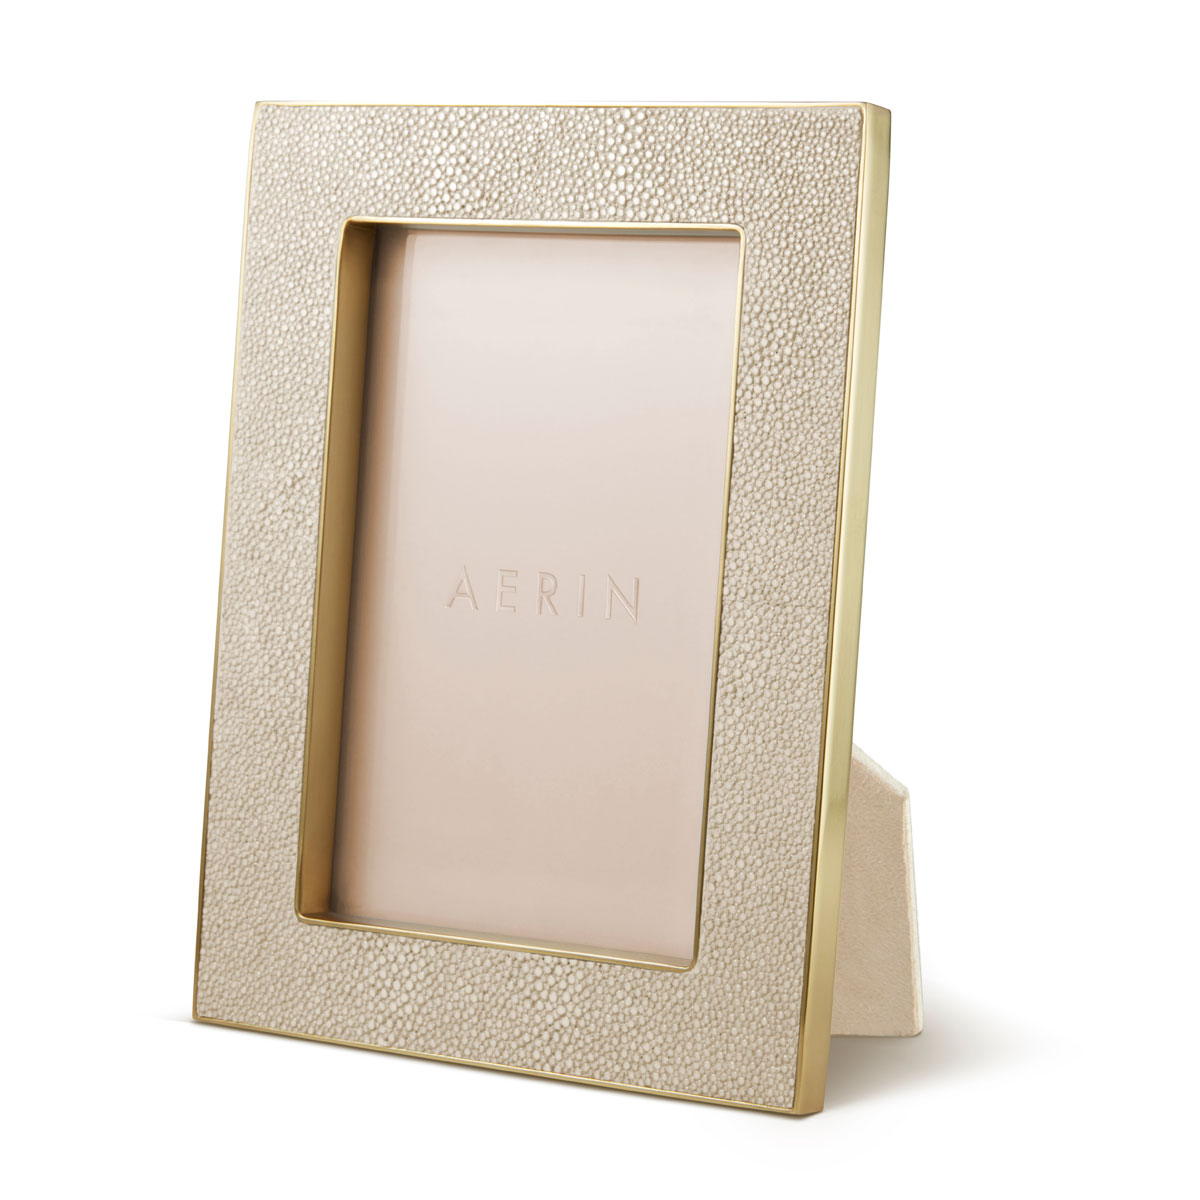 "Aerin Classic Shagreen Frame, Wheat 4x6"""